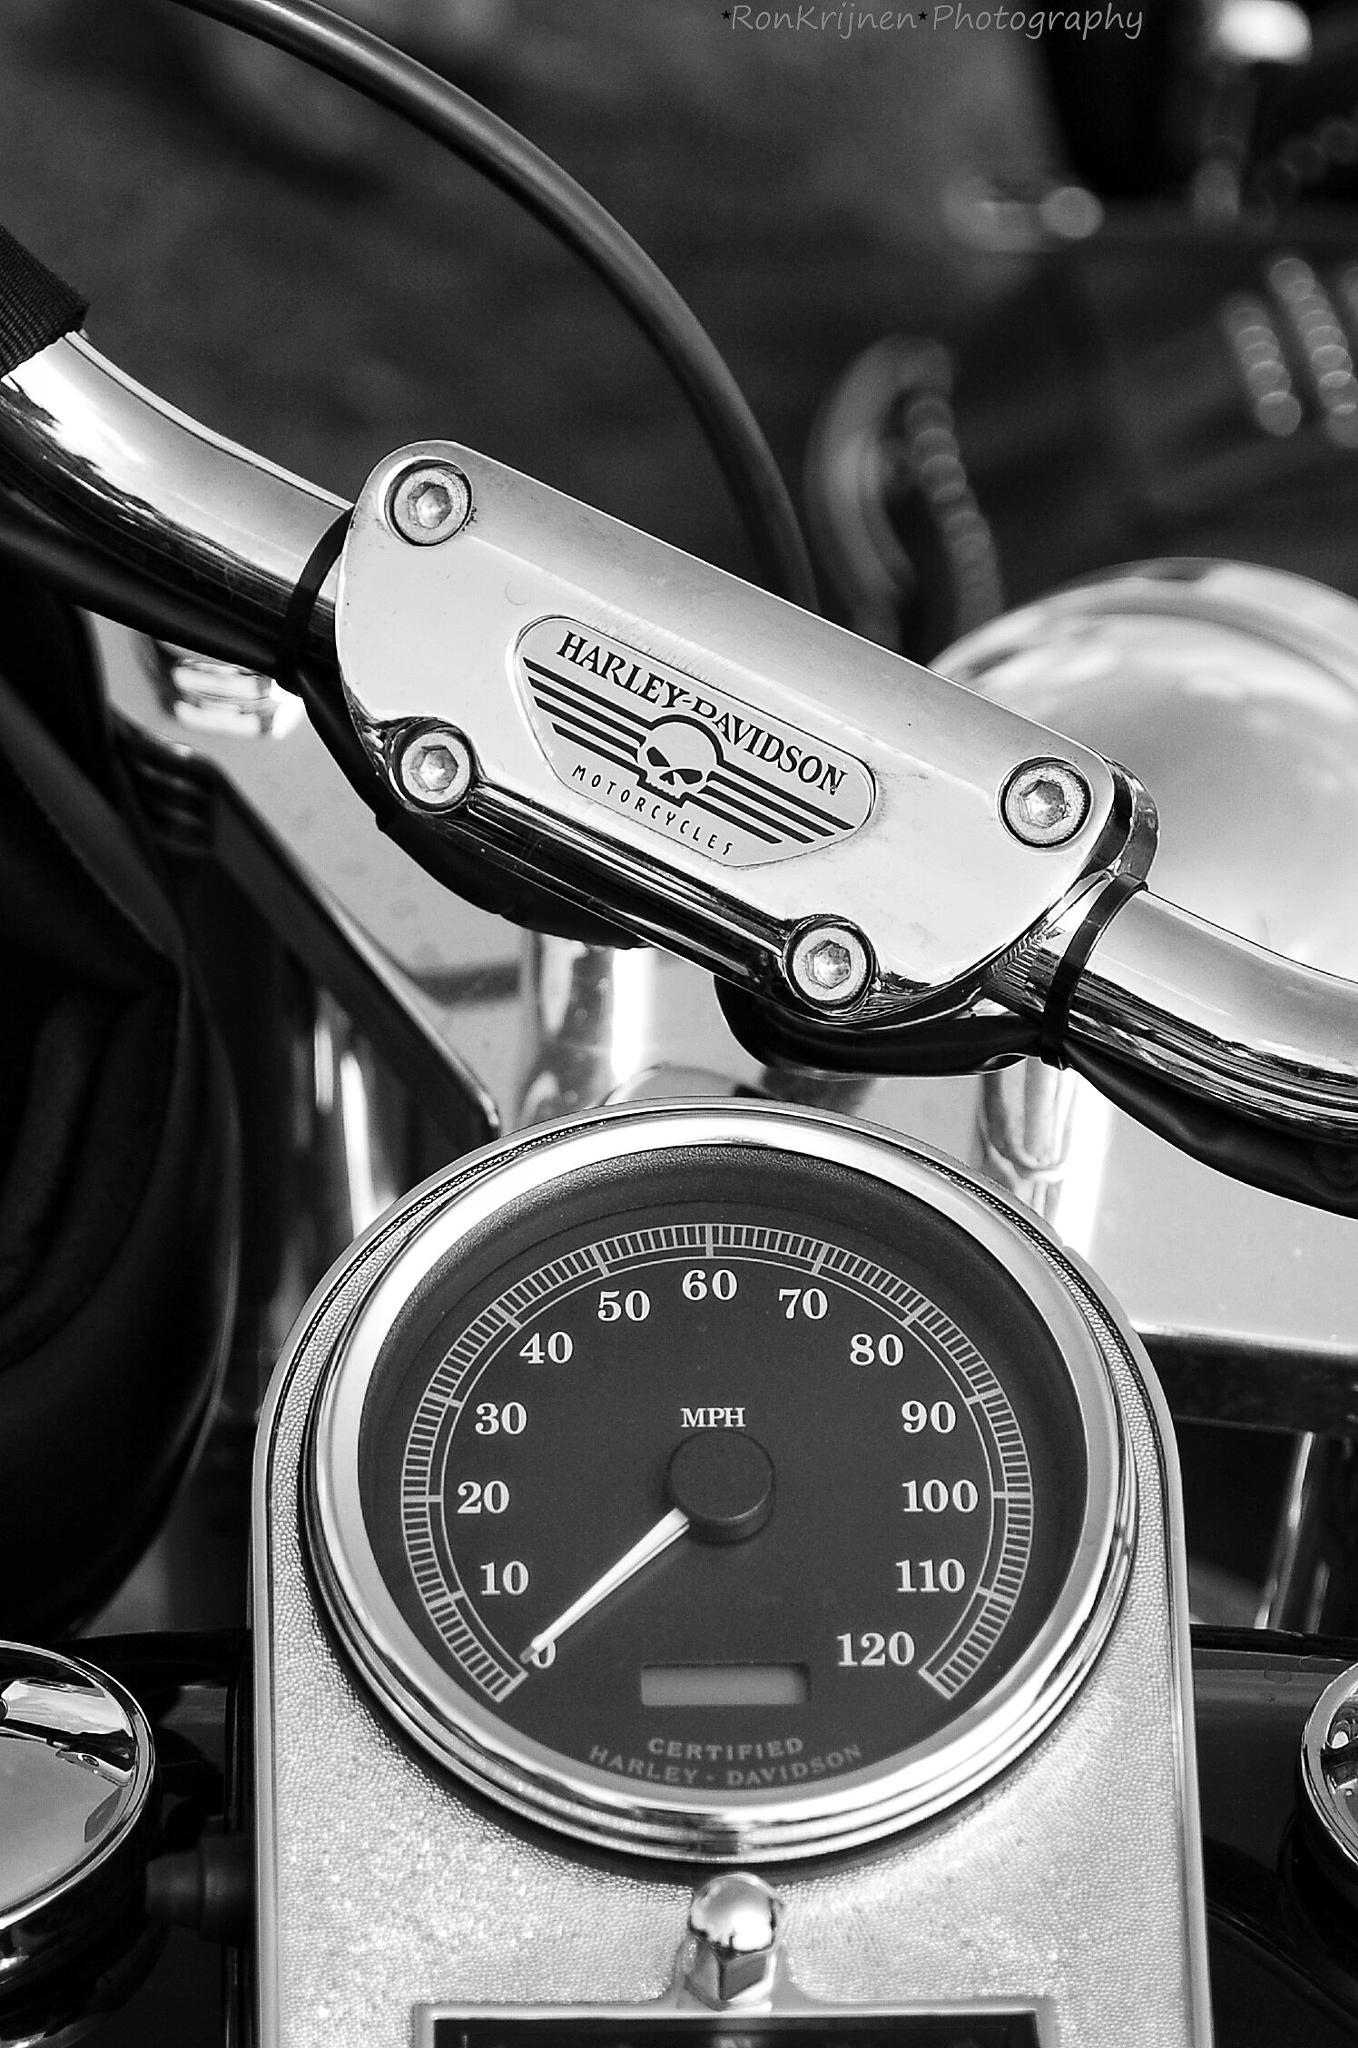 Harley Davidson by ron.krijnen